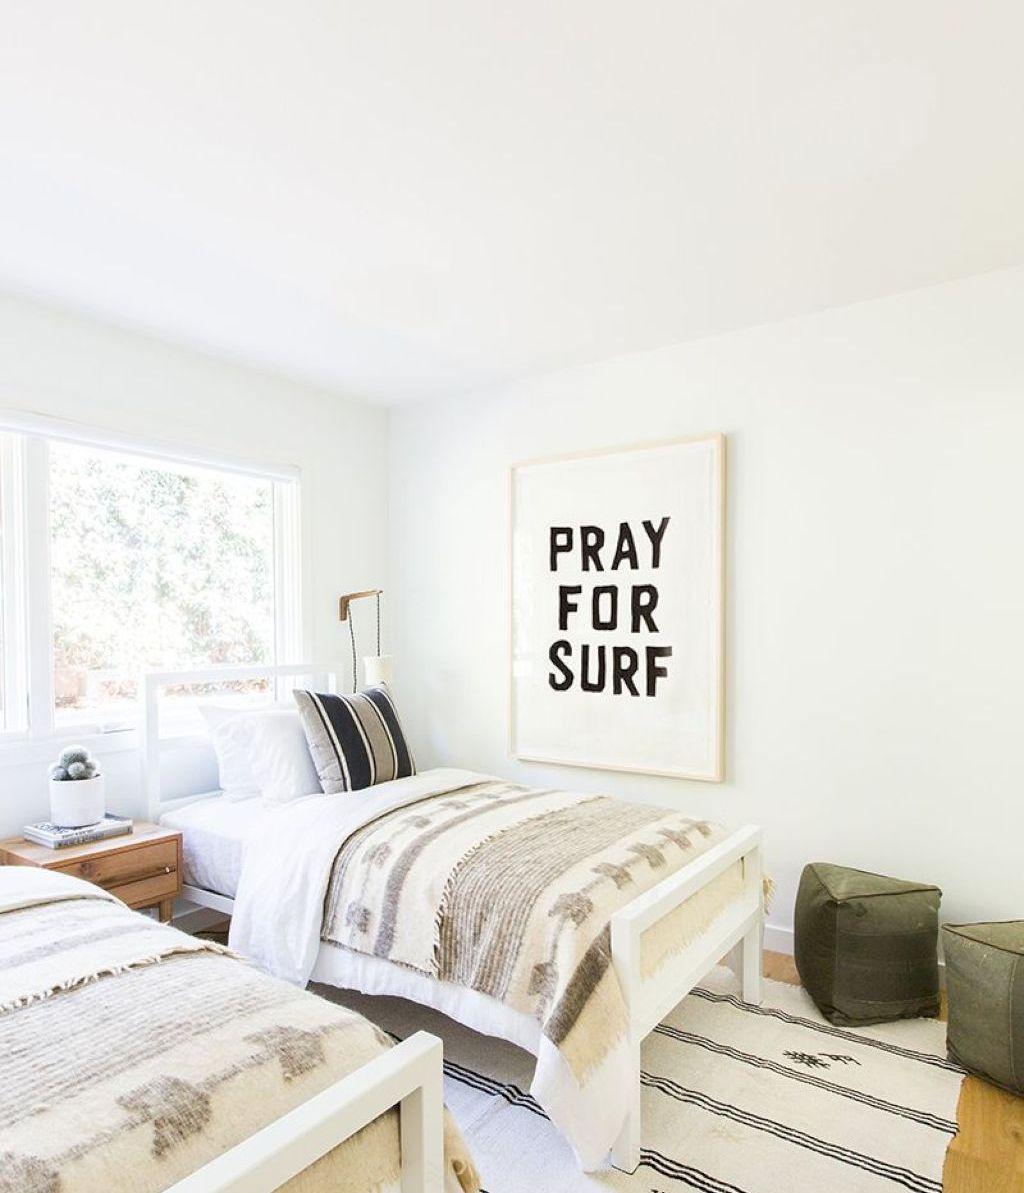 Mid Century Modern Kids Bedroom Ideas: 50 Comfy Modern Mid Century Bedroom Decorating Ideas